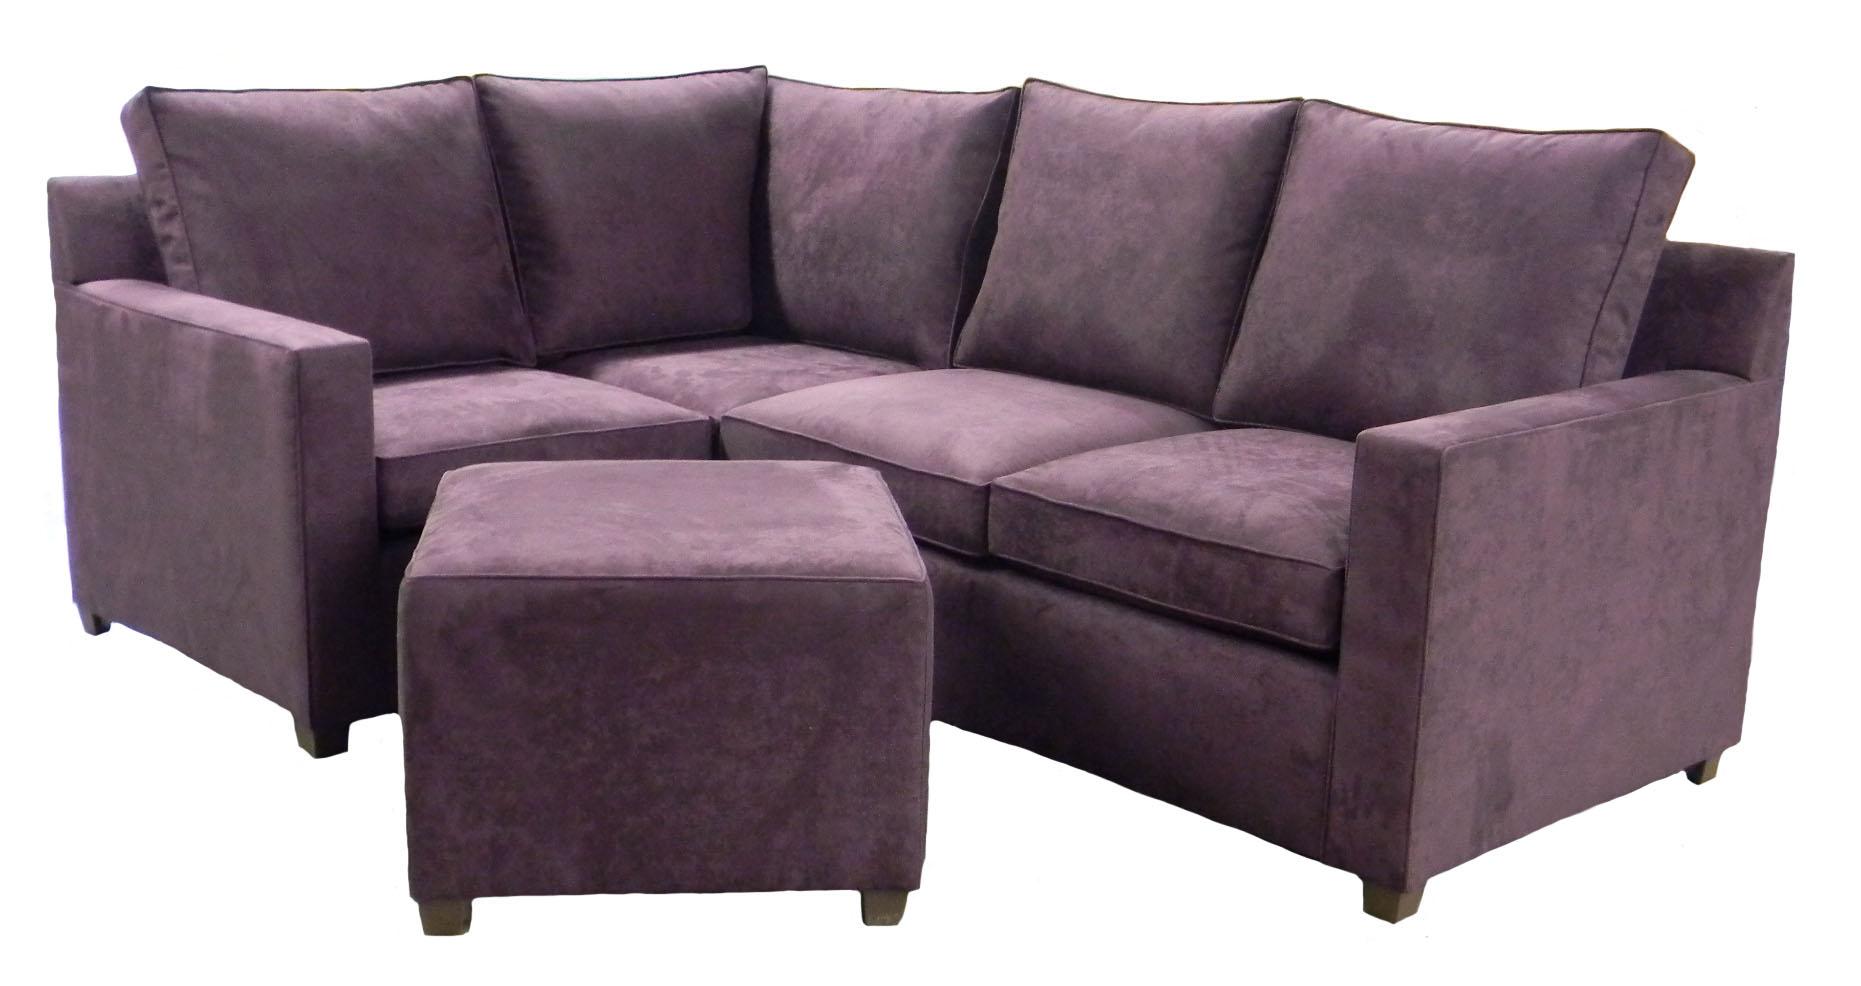 Purple Apartment Size Sleeper Sofa